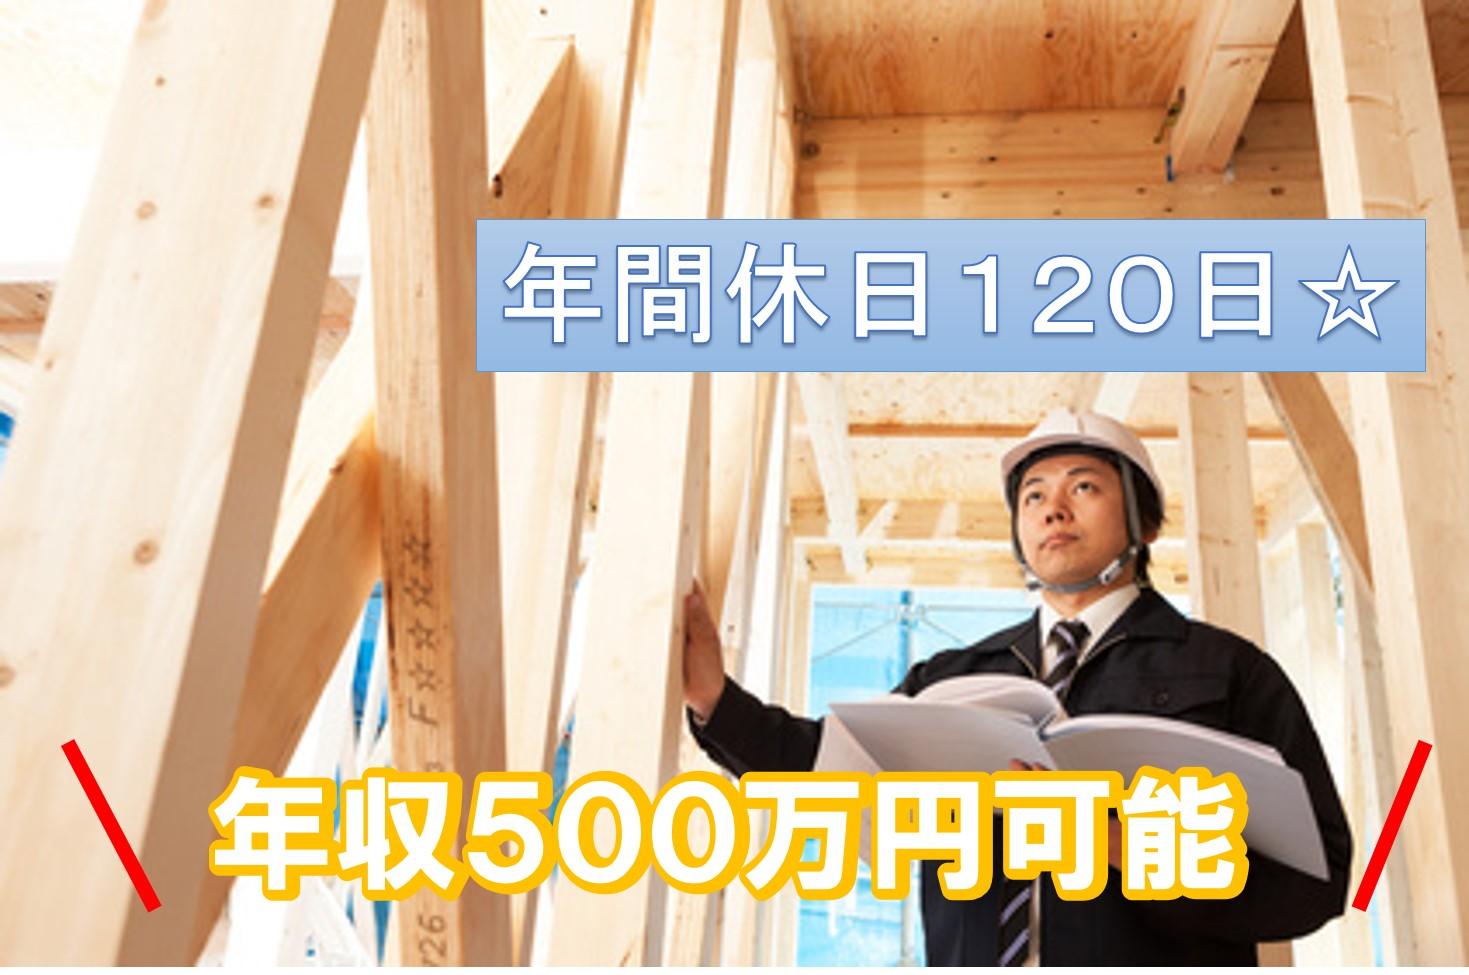 施工管理 東京都千代田区 【10856】 イメージ